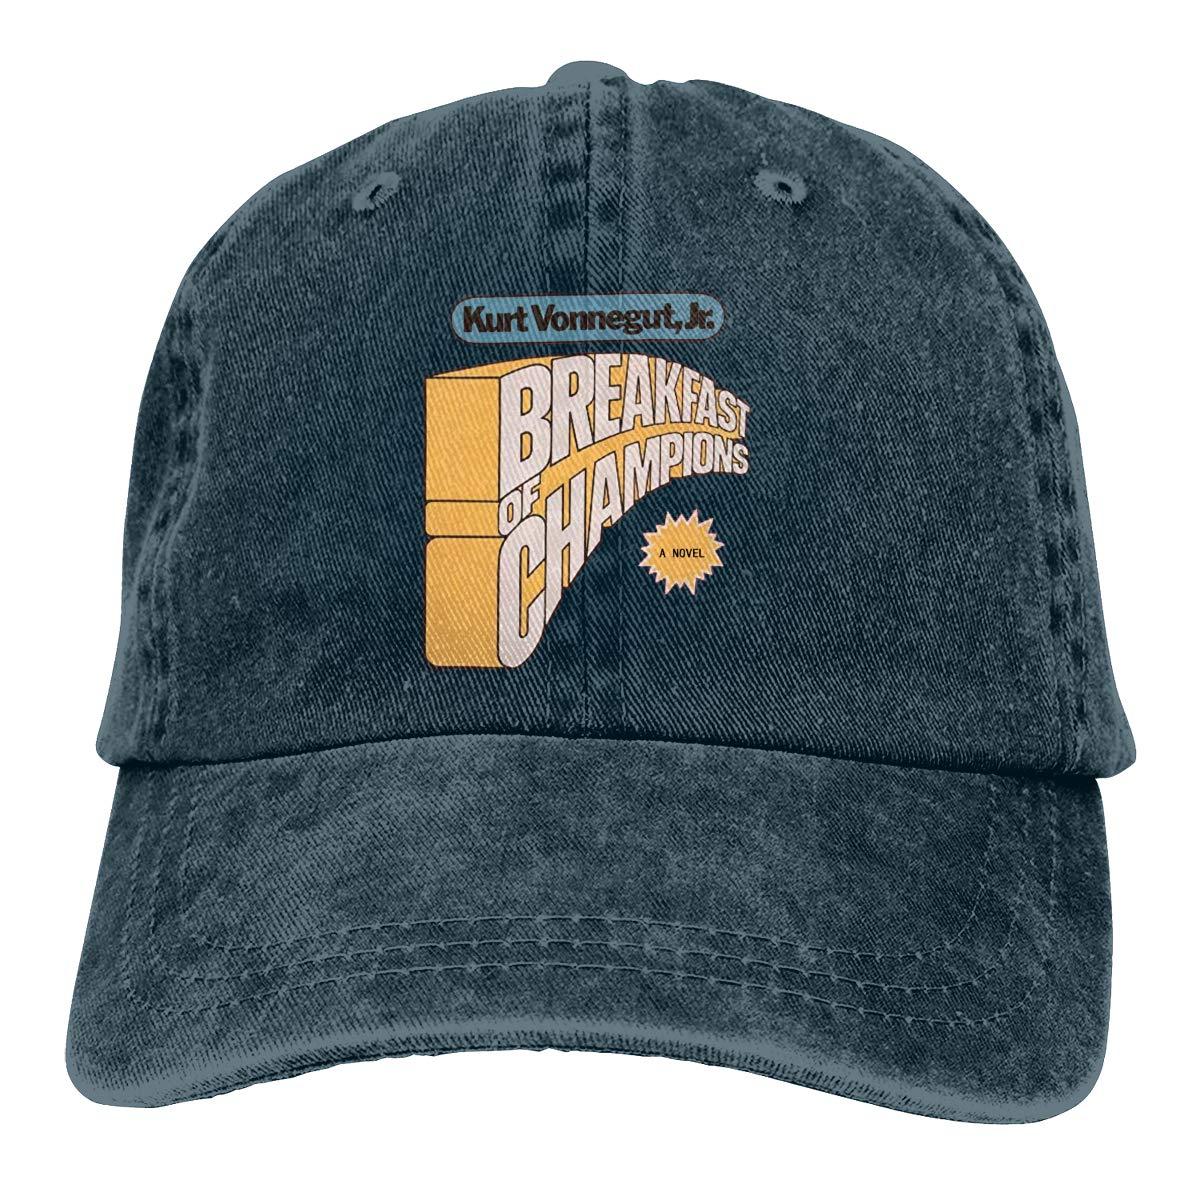 Feeling Unique Breakfast of Champions Vintage Jeans Baseball Cap Classic Cotton Dad Hat Adjustable Plain Cap Black